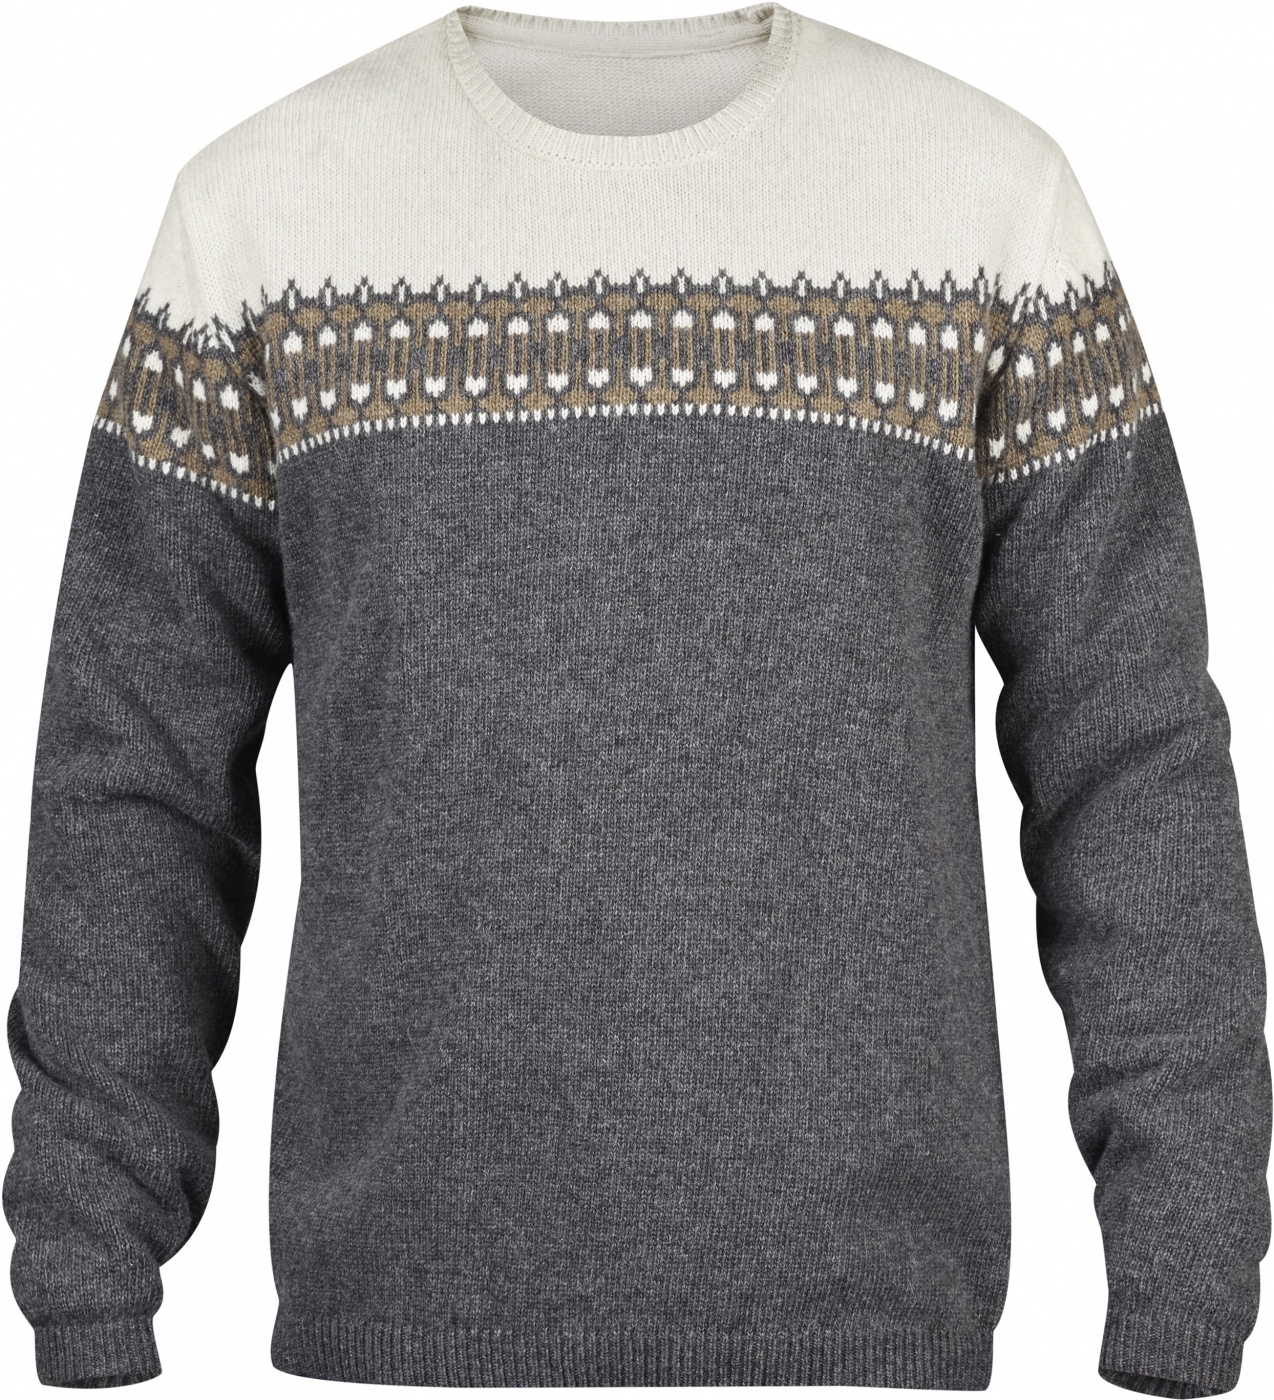 FjallRaven Övik Scandinavian Sweater Grey-30